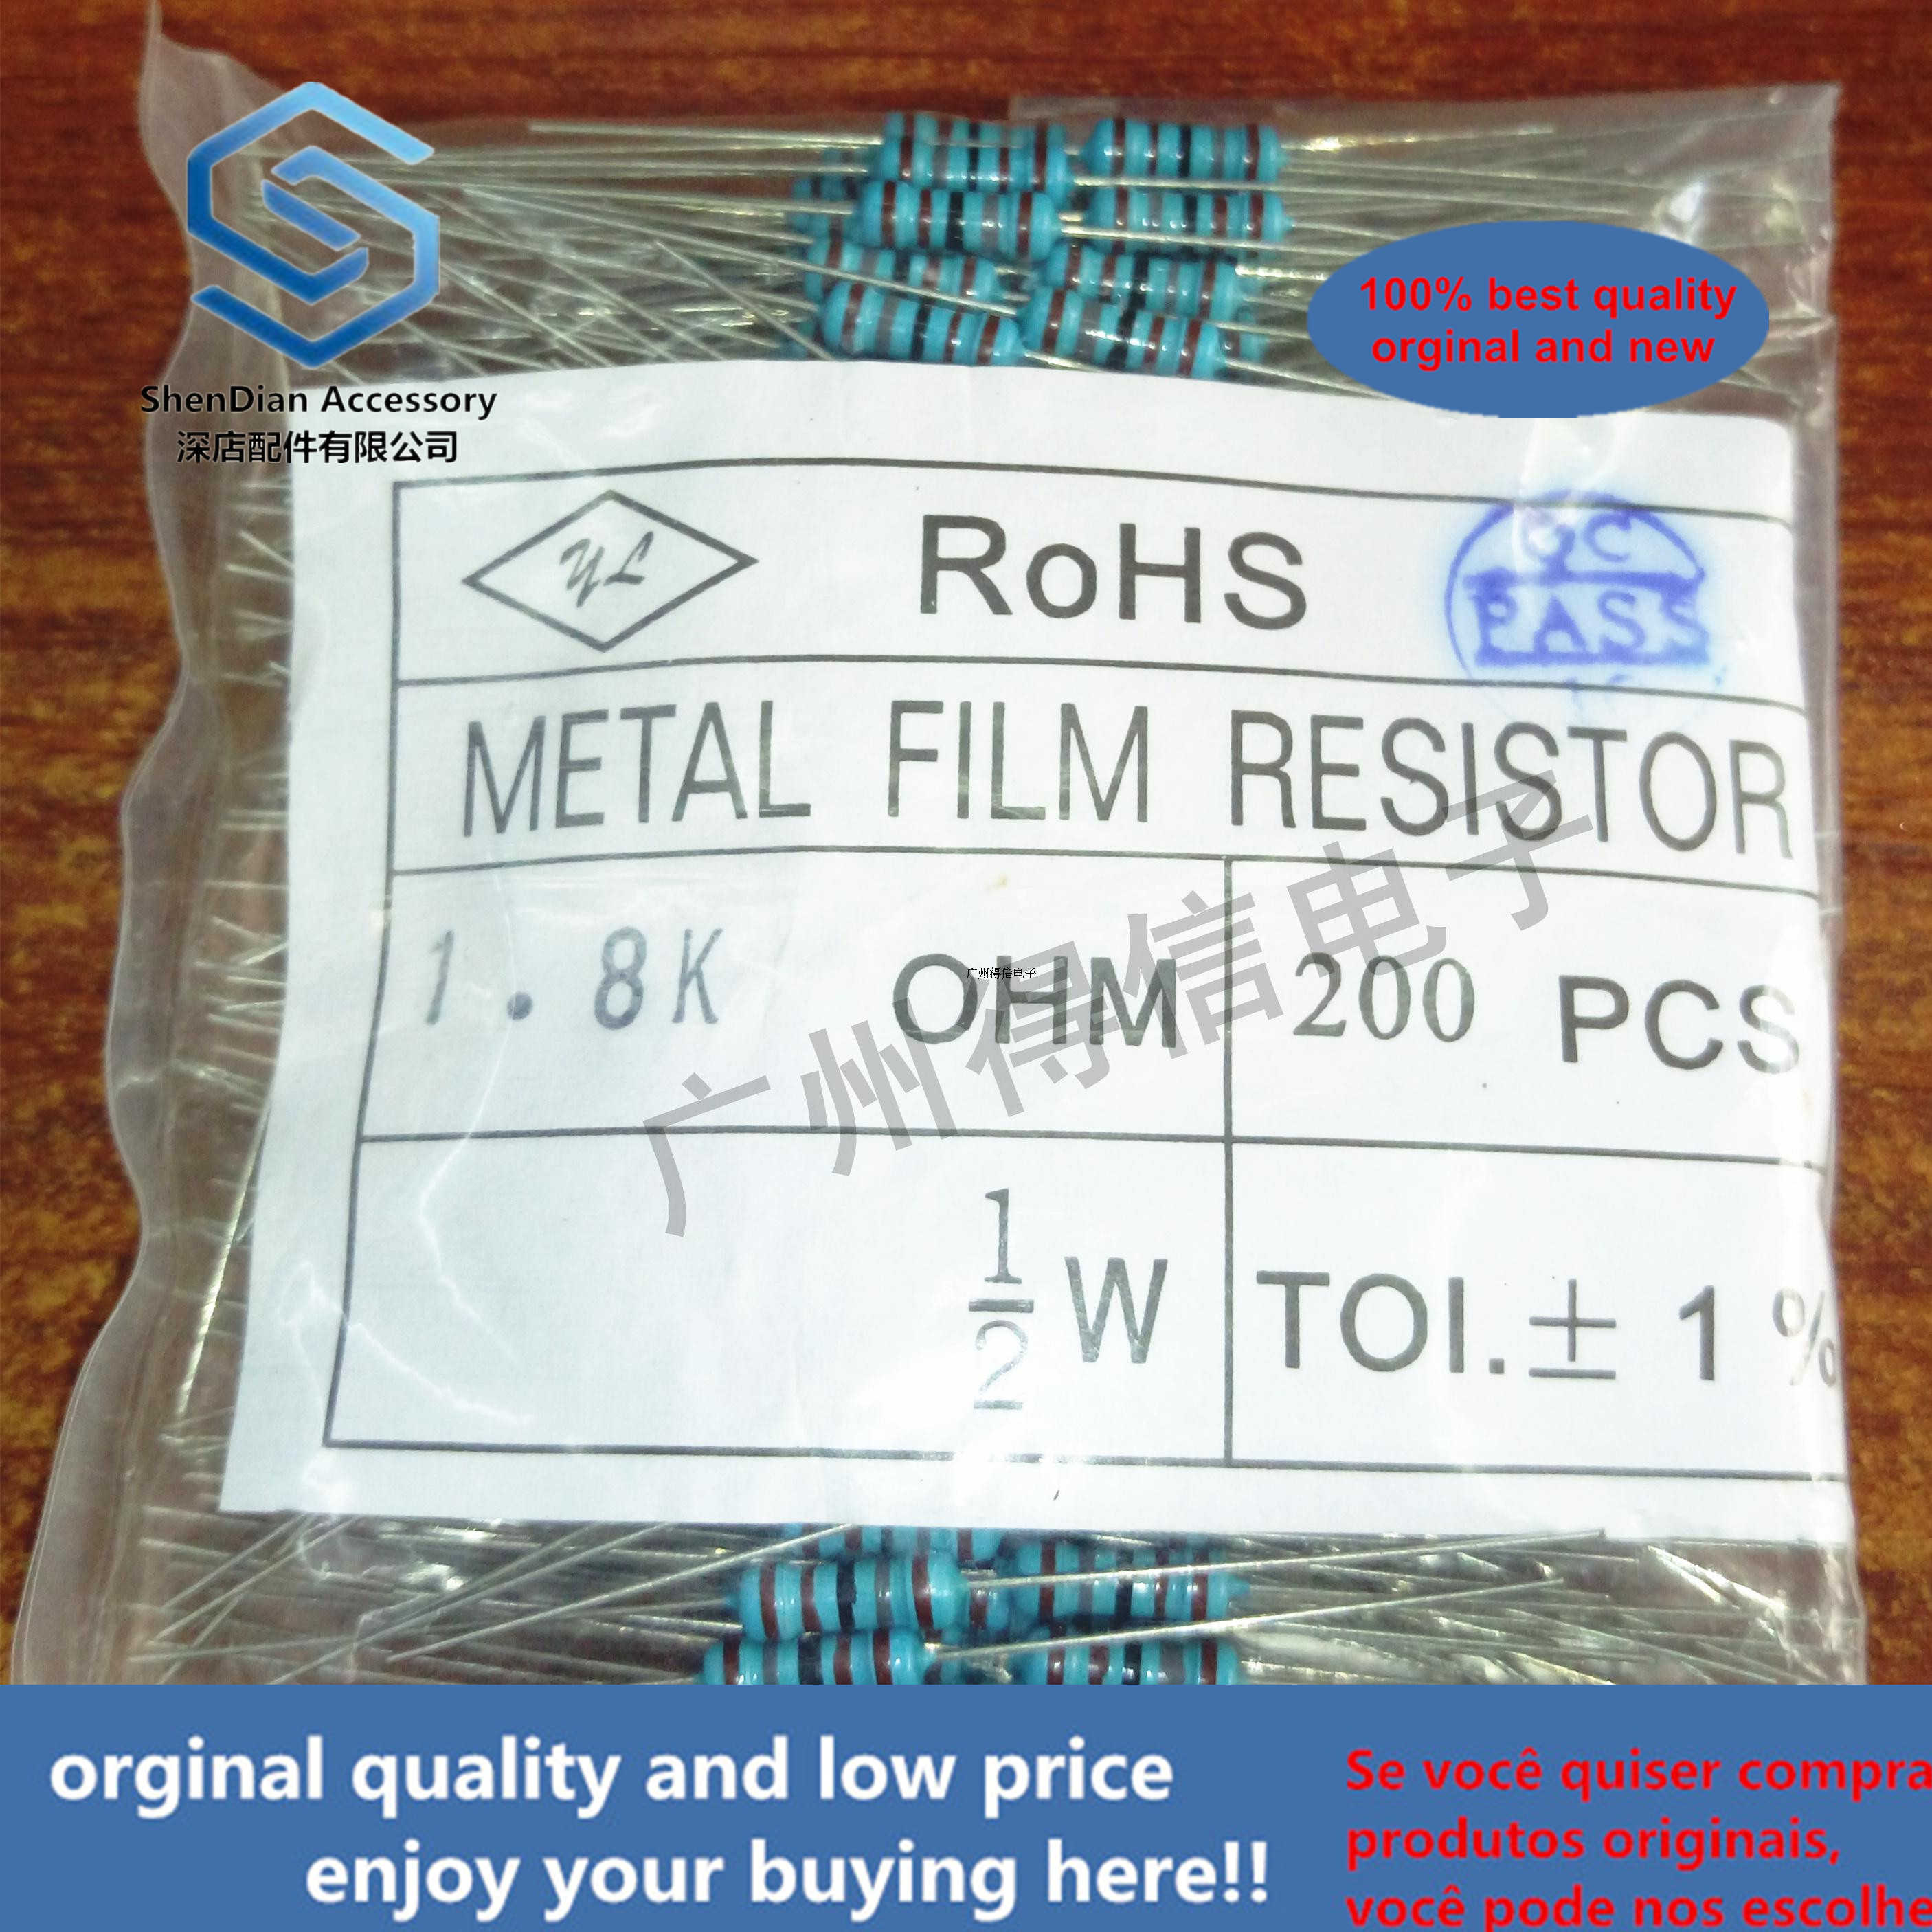 200pcs 1 / 2W 6.2K 6200 Euro 1% Brand New Metal Film Iron Feet Resistor Bag 200 Pcs Per Pack